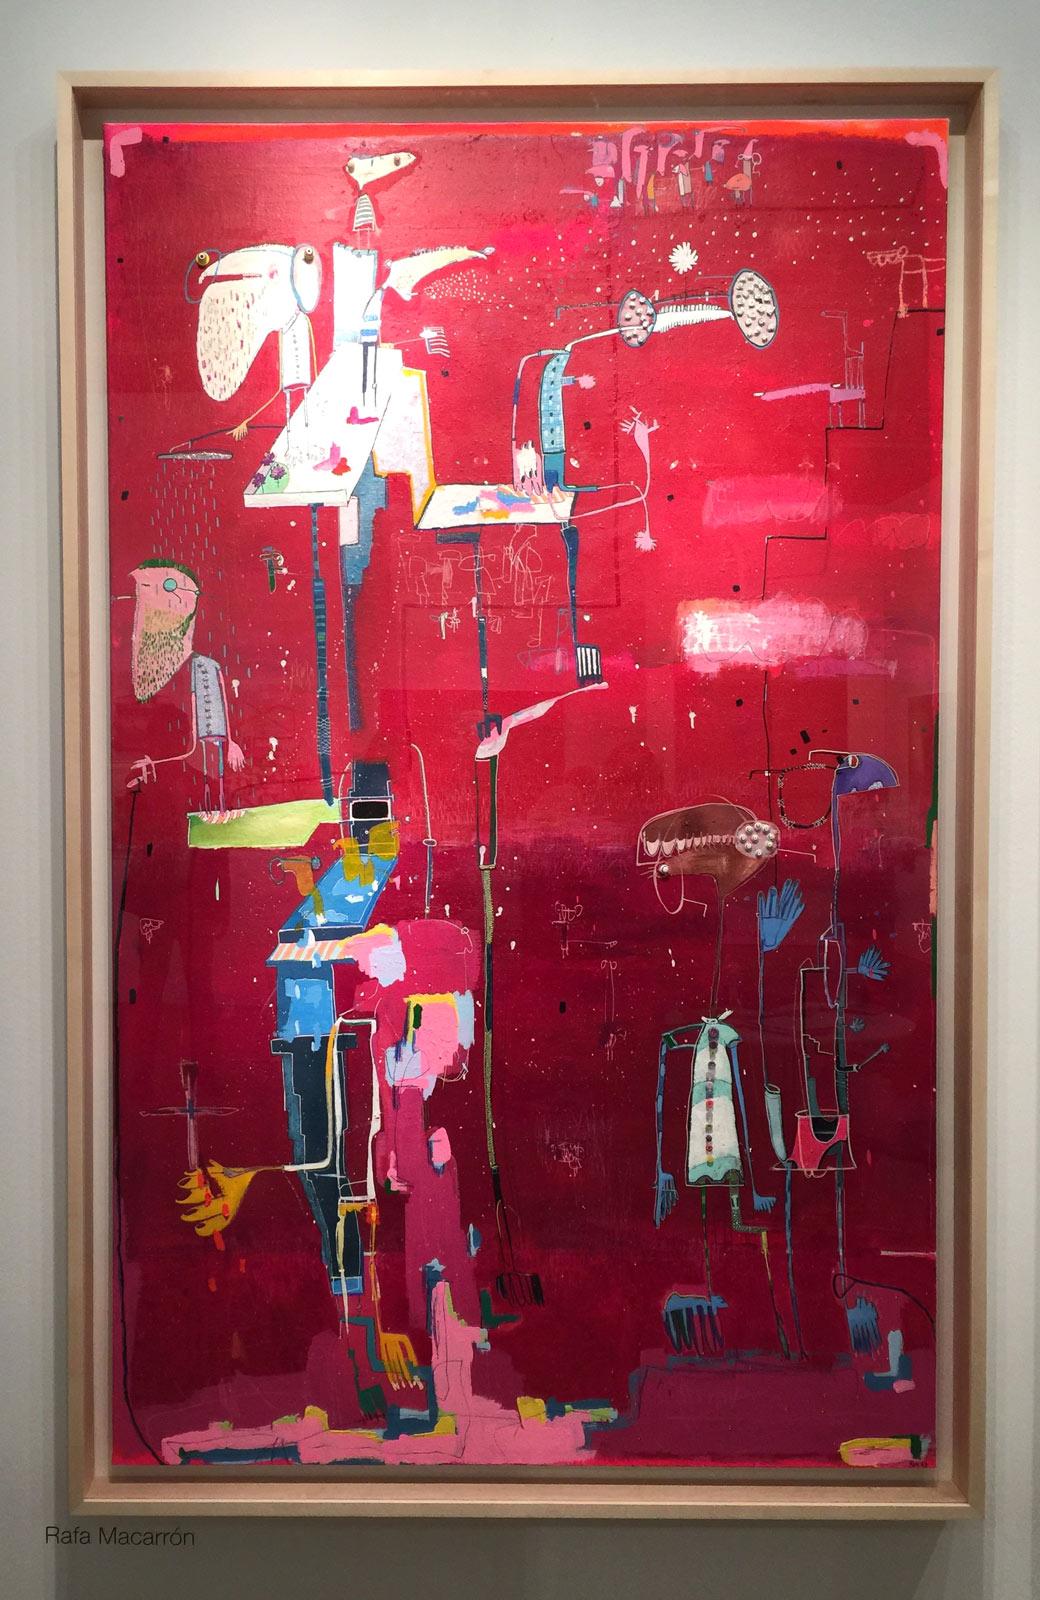 Macarron-Rafa-Mixed-Media-aluminum-Juan-Silio-New-York-Art-Expo.jpg